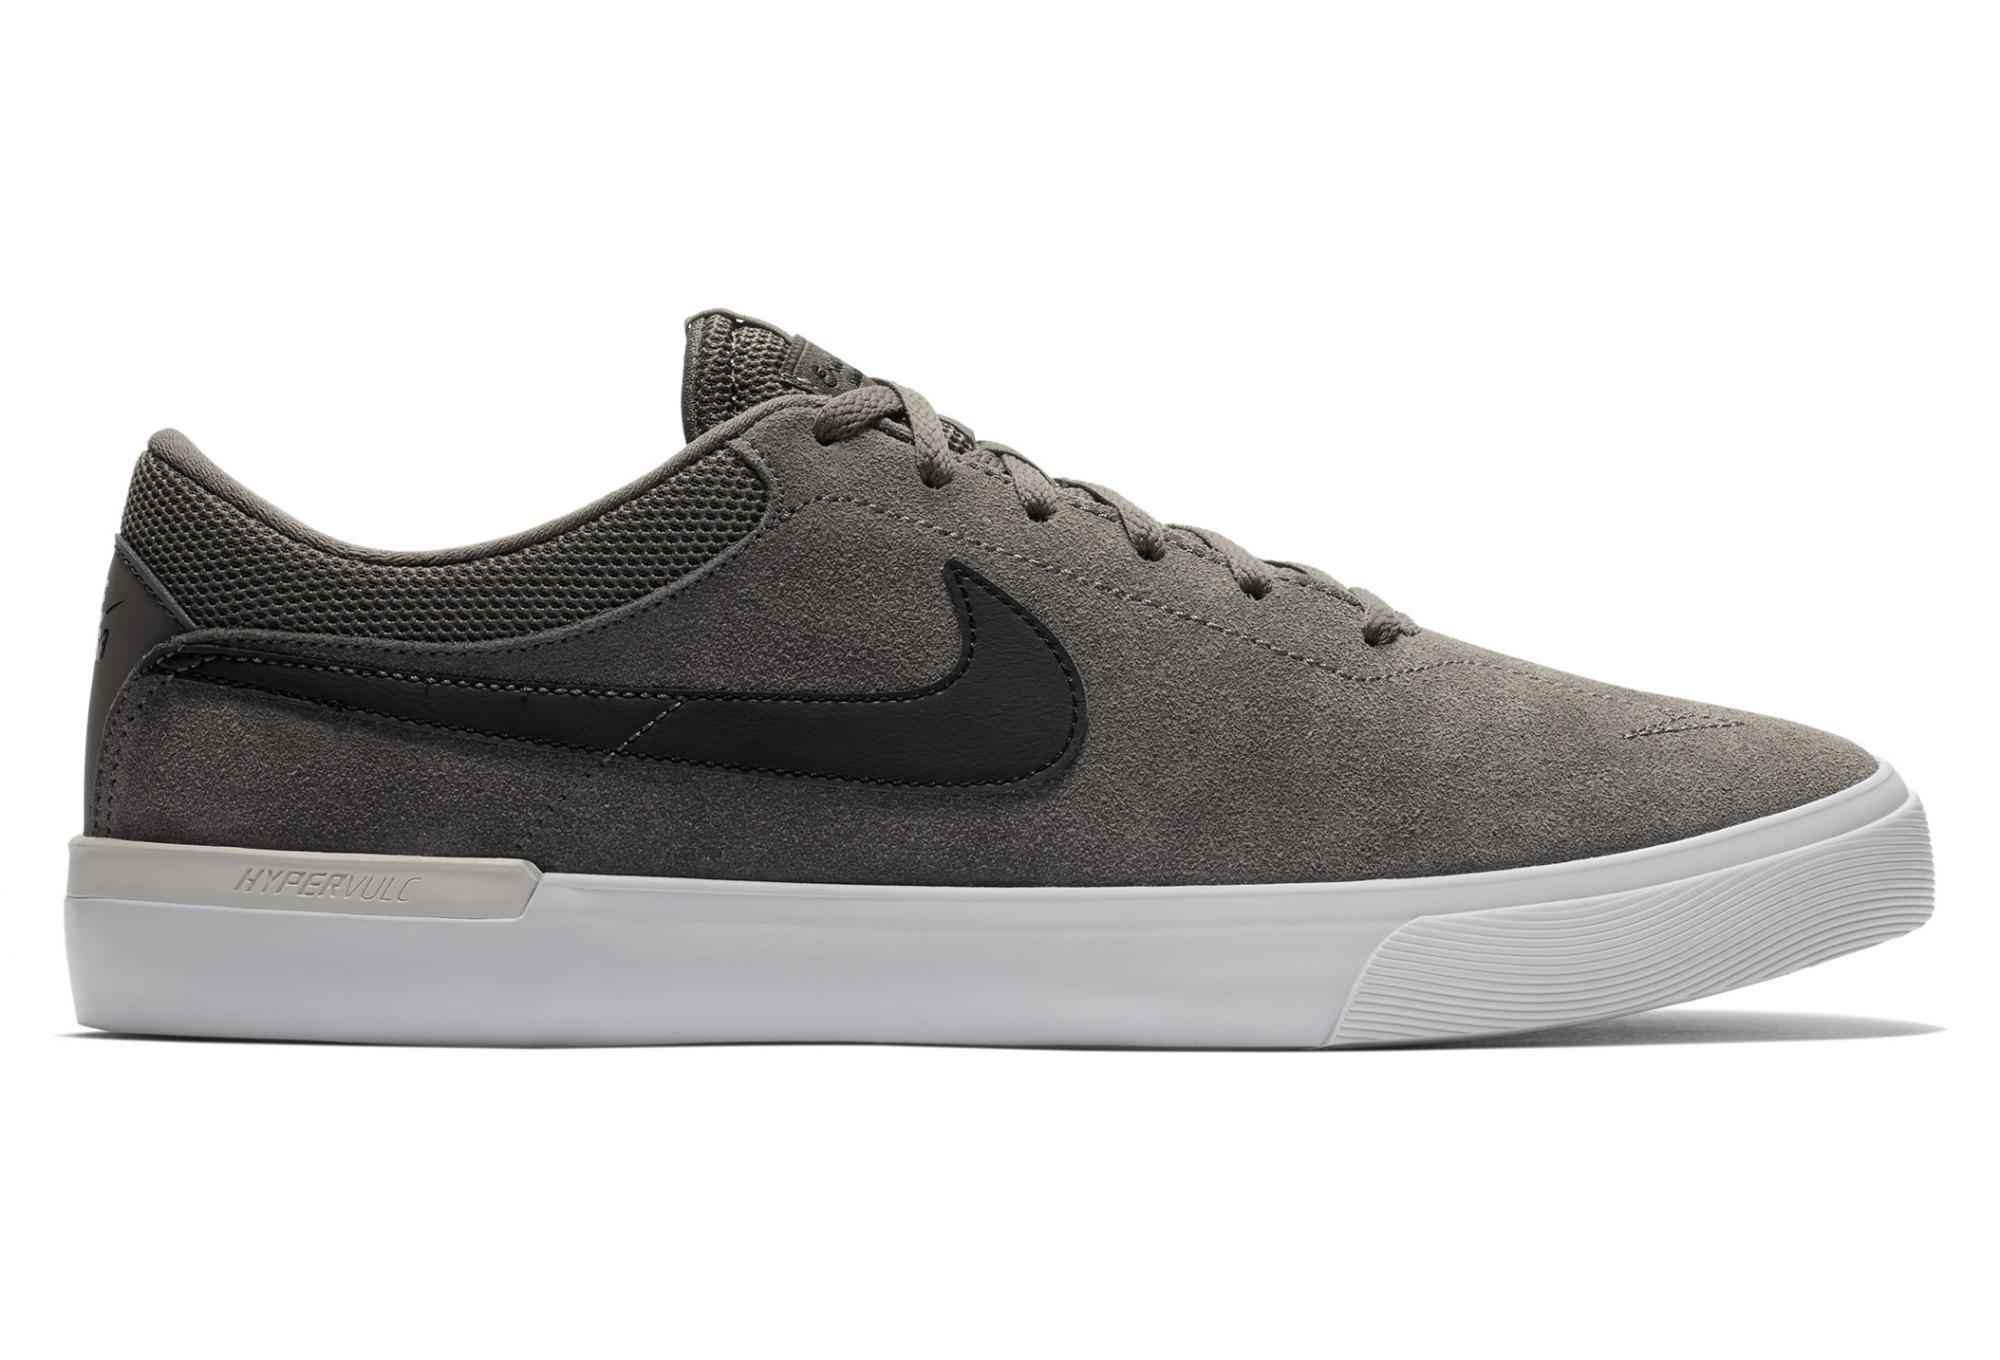 cafd55111ff1 Nike SB Hypervulc Eric Koston Shoes Dark Grey